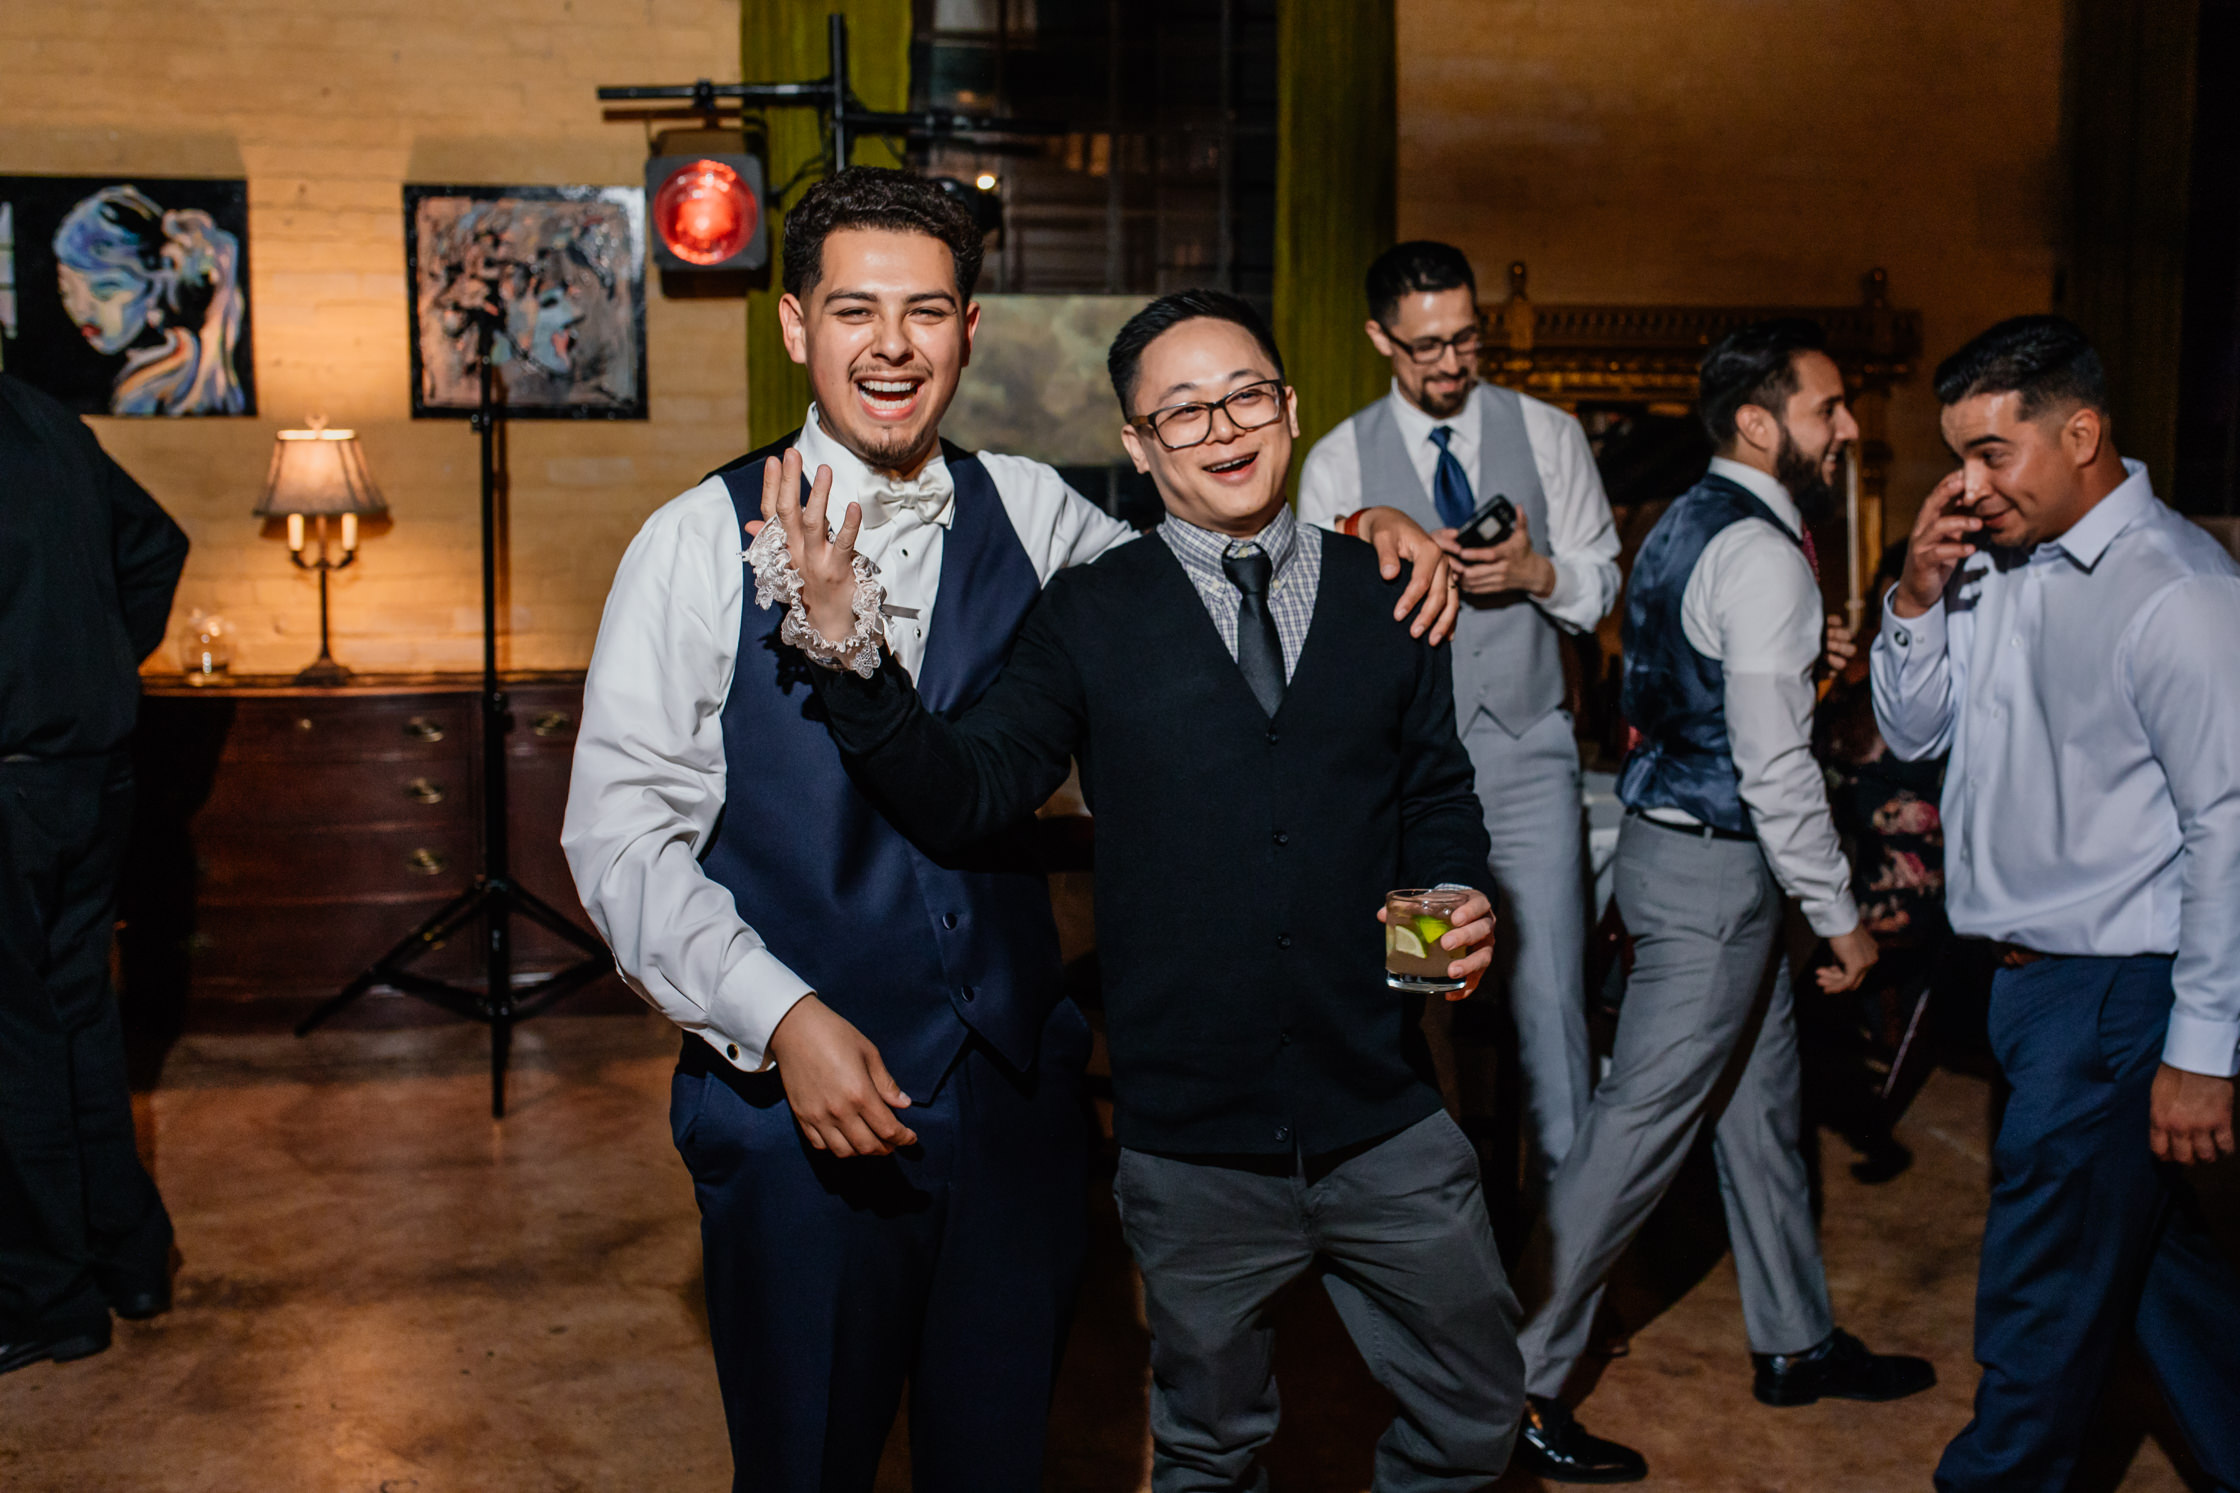 luis_joanna_wedding-129.jpg